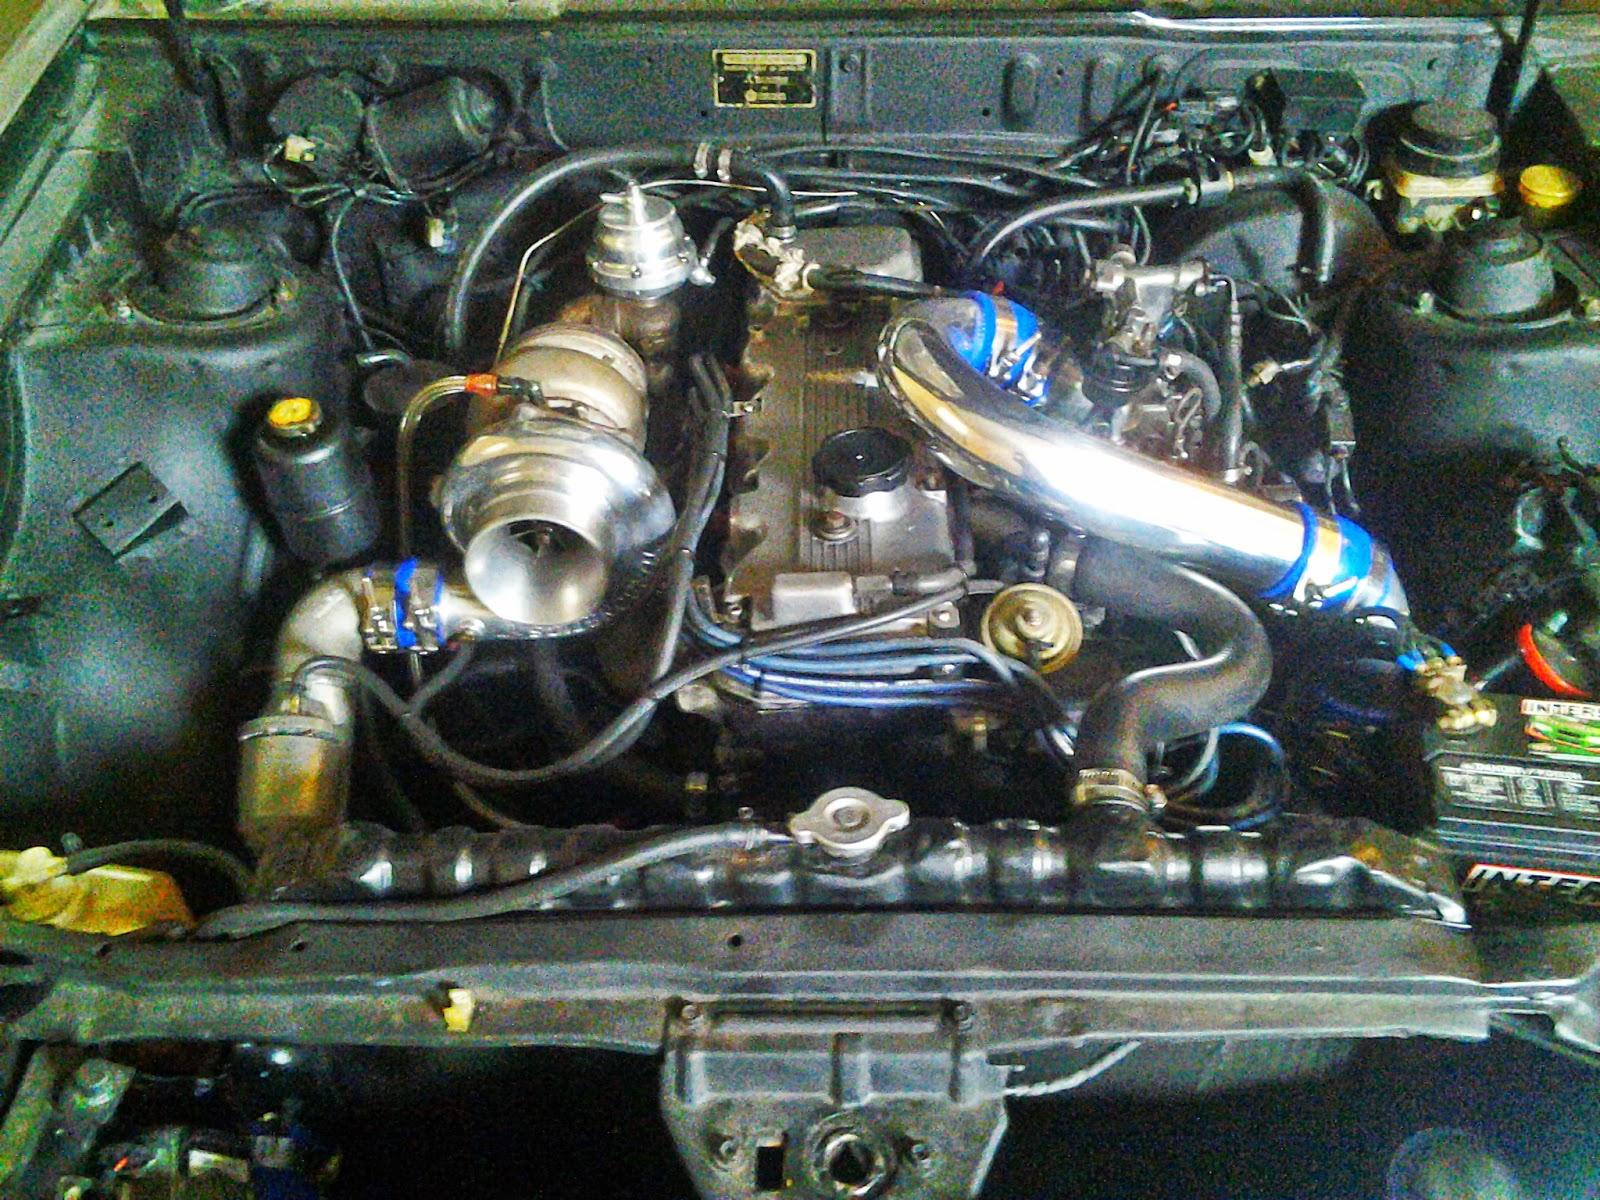 Mitsubishi Starion Engine Diagram Not Lossing Wiring 4g63 Library Rh 8 Skriptoase De 1988 Interior Champ 1984 Swap